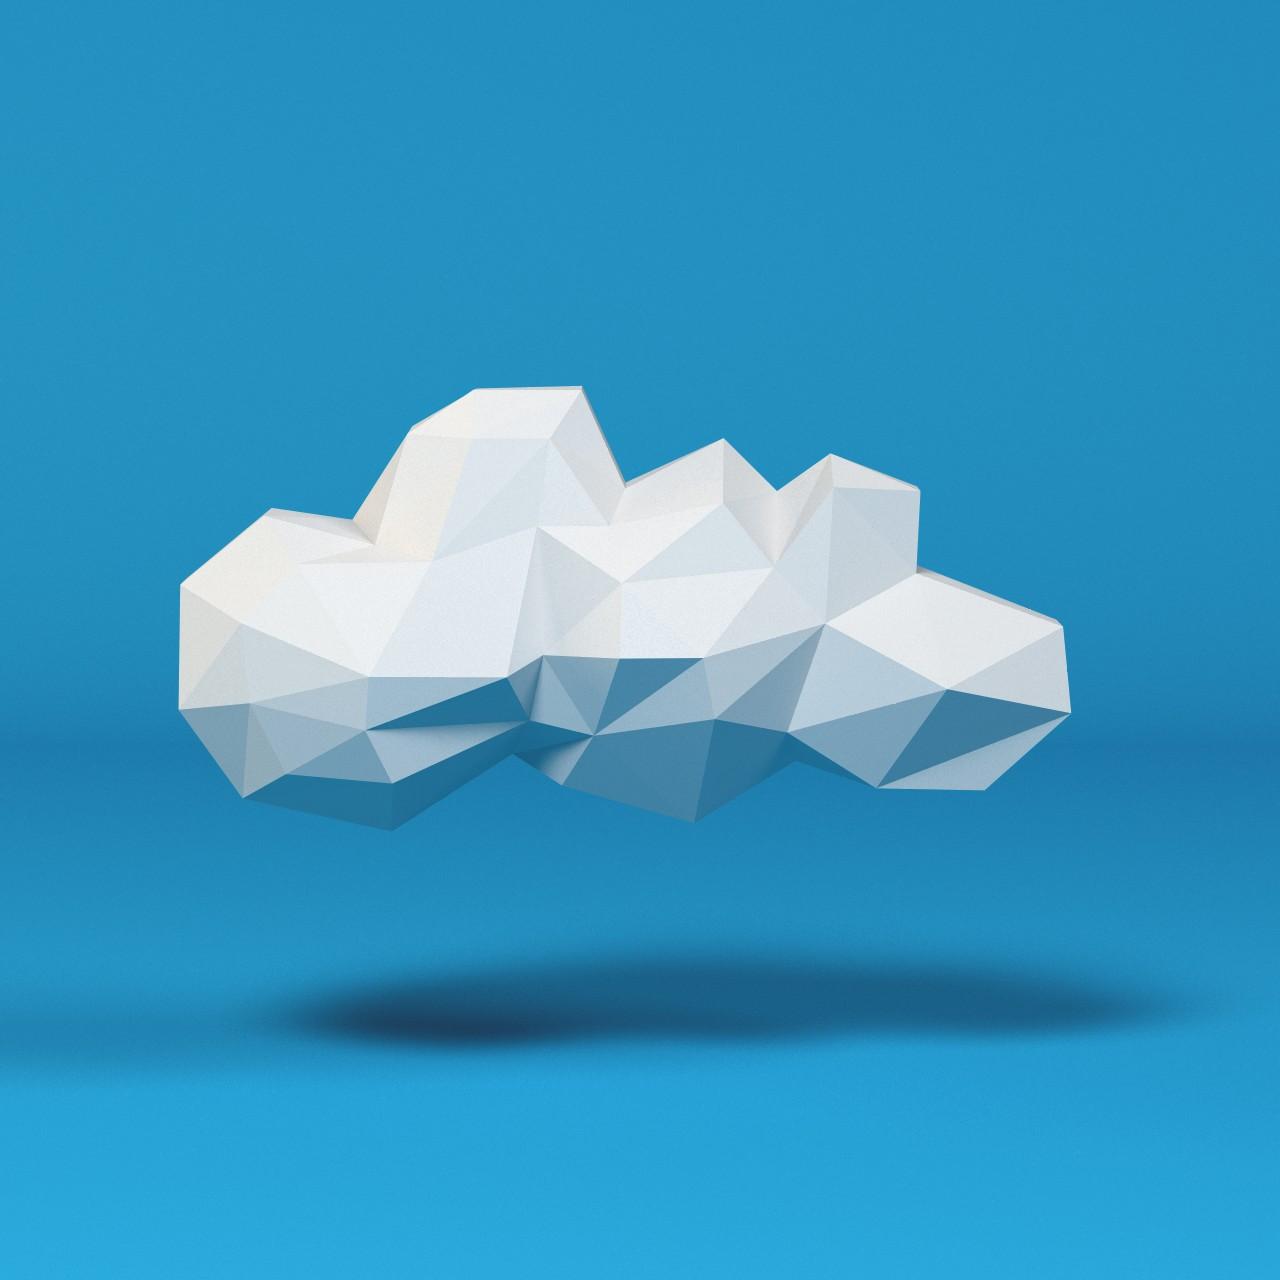 poly_cloud_4_1.jpg